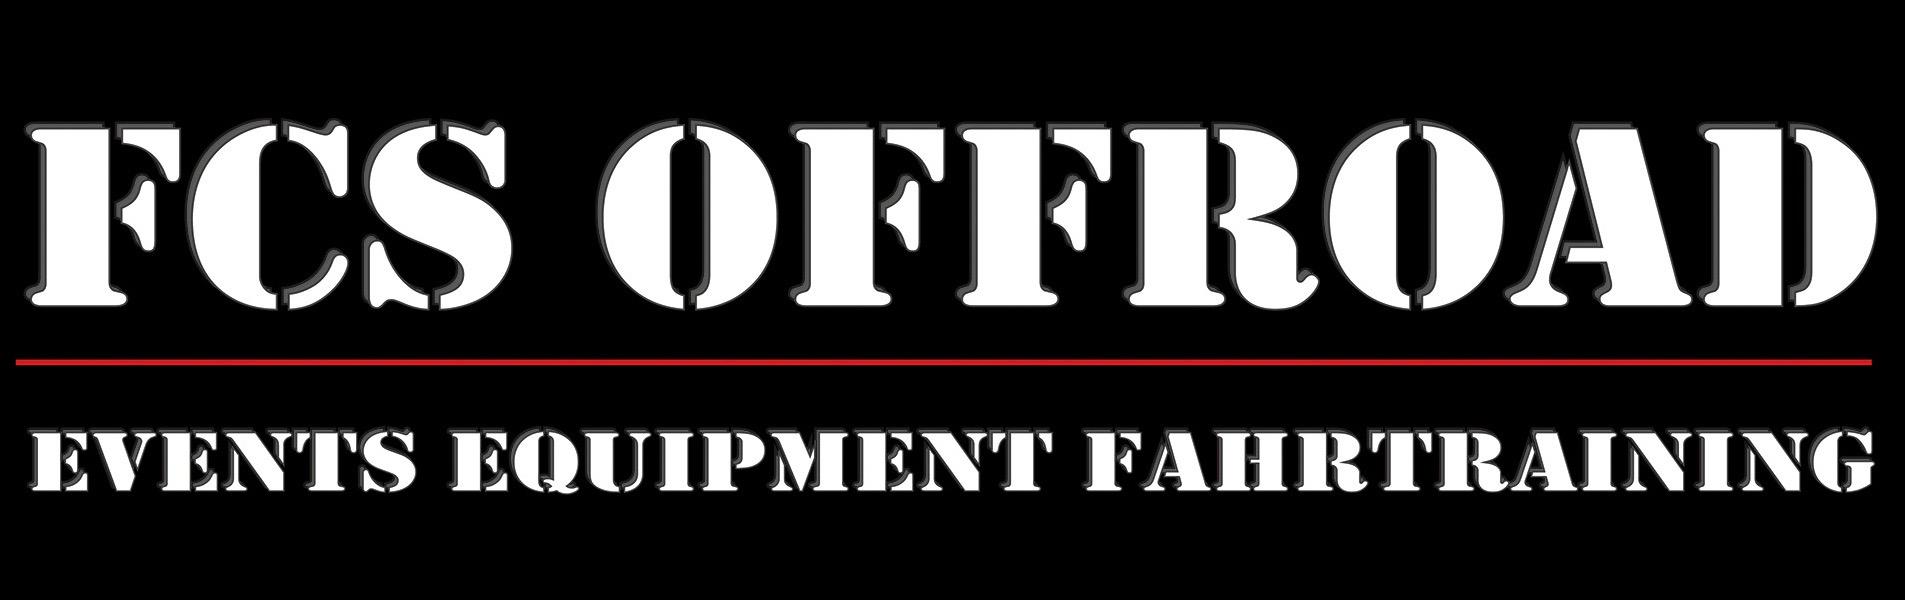 FCS Offroad